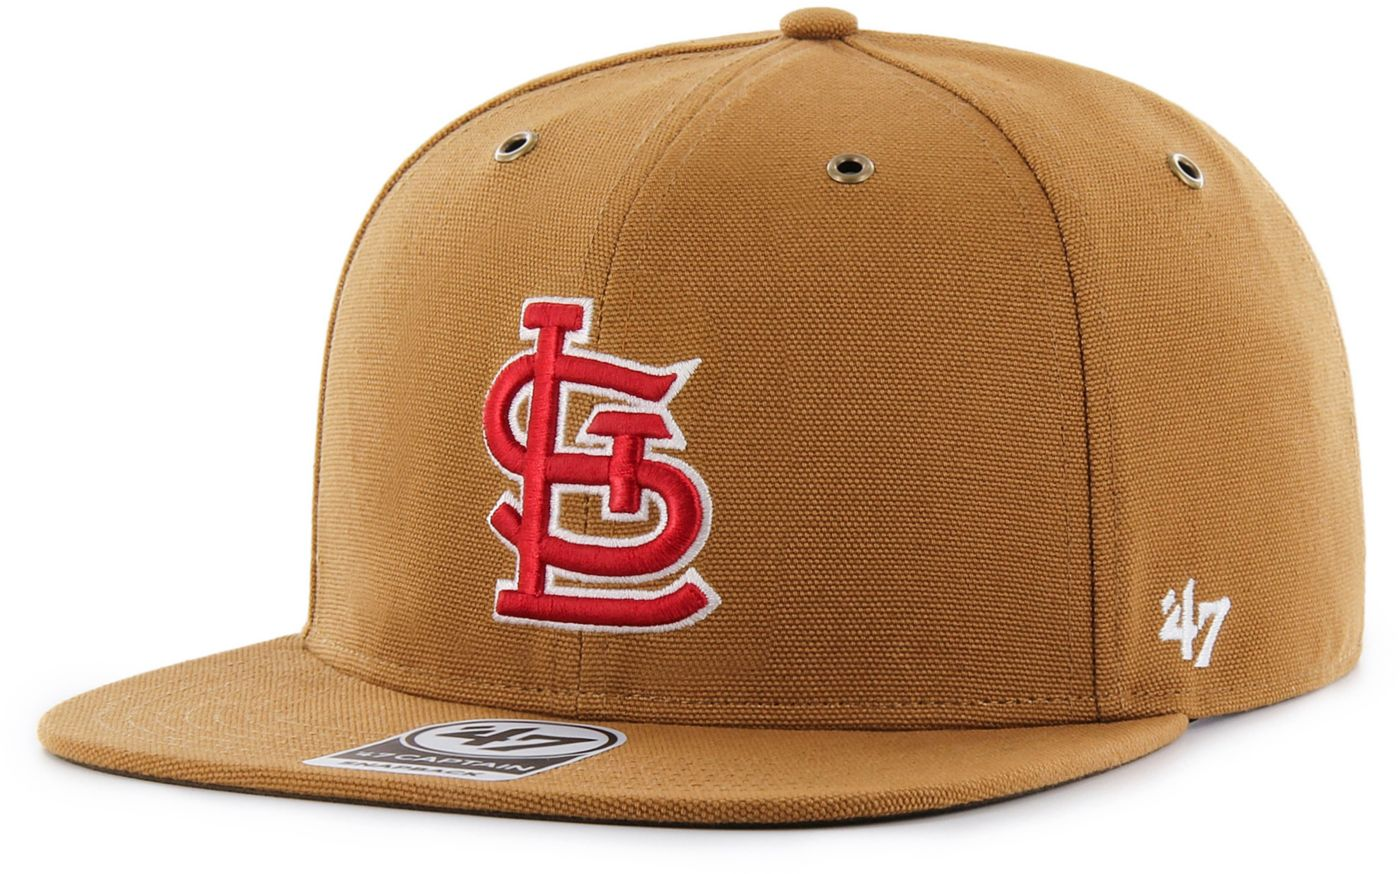 '47 Men's St. Louis Cardinals Carhartt Captain Brown Adjustable Snapback Hat